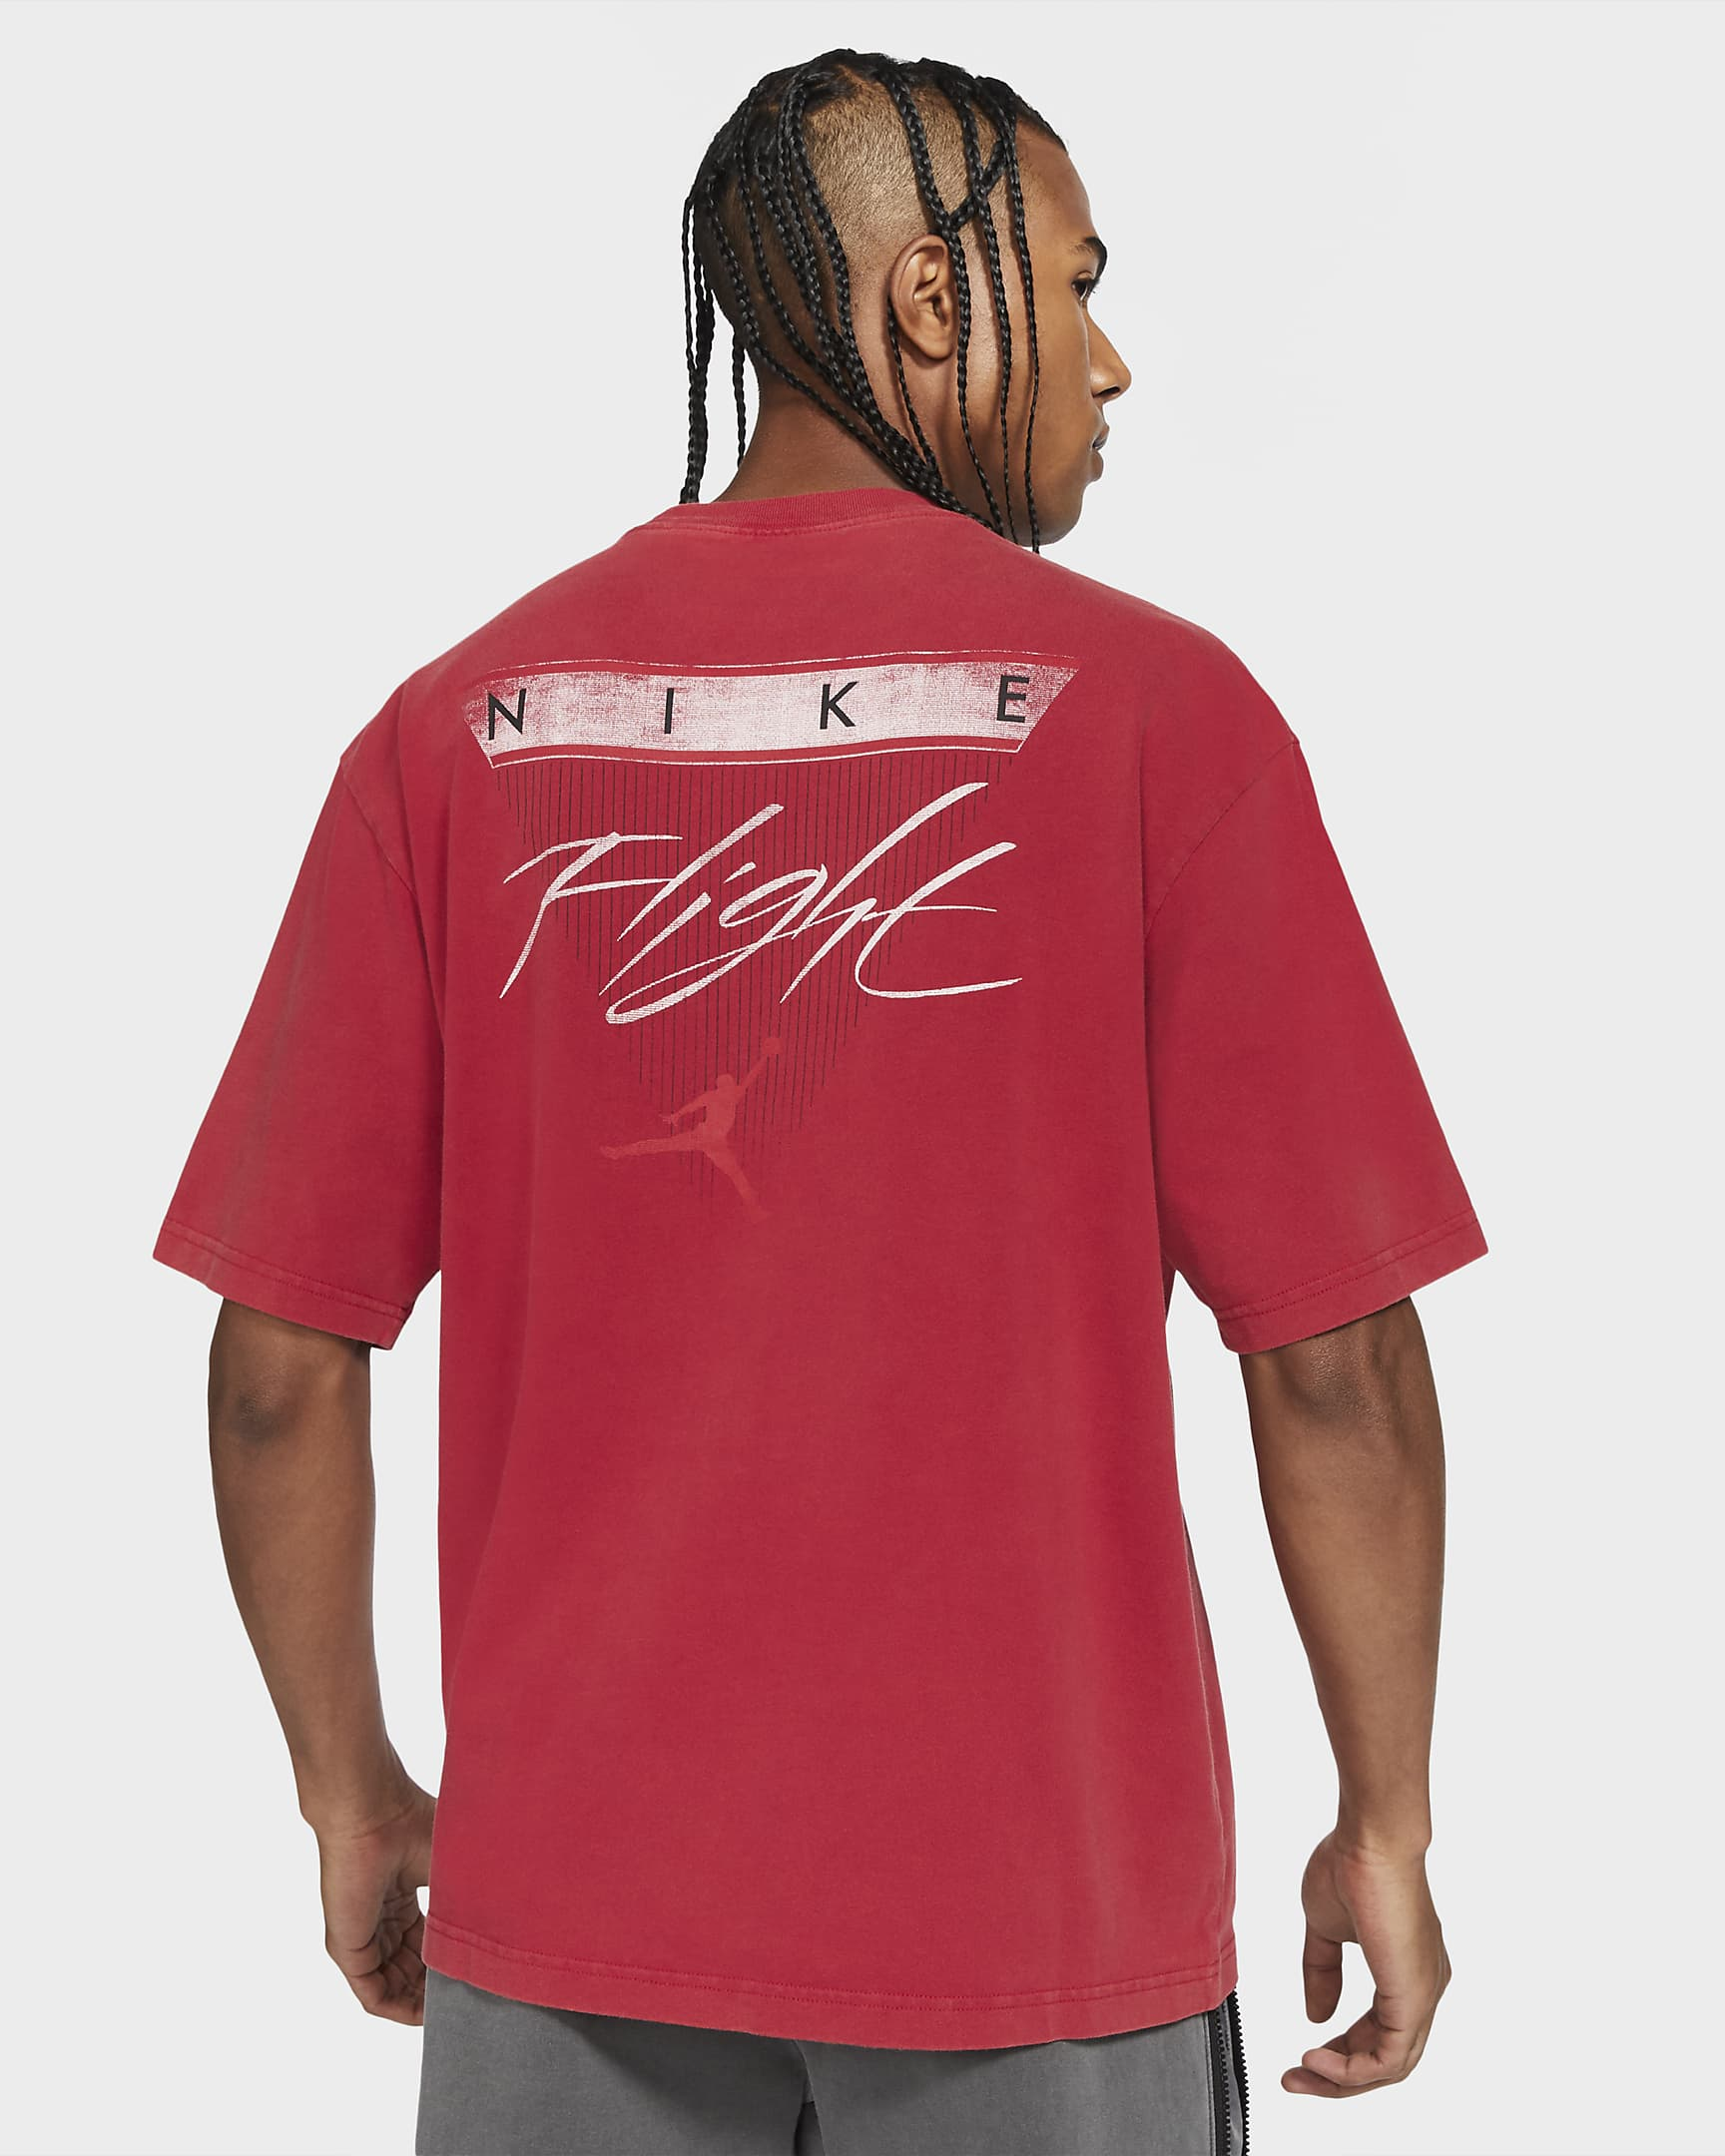 jordan-flight-mens-short-sleeve-t-shirt-C564t8-3